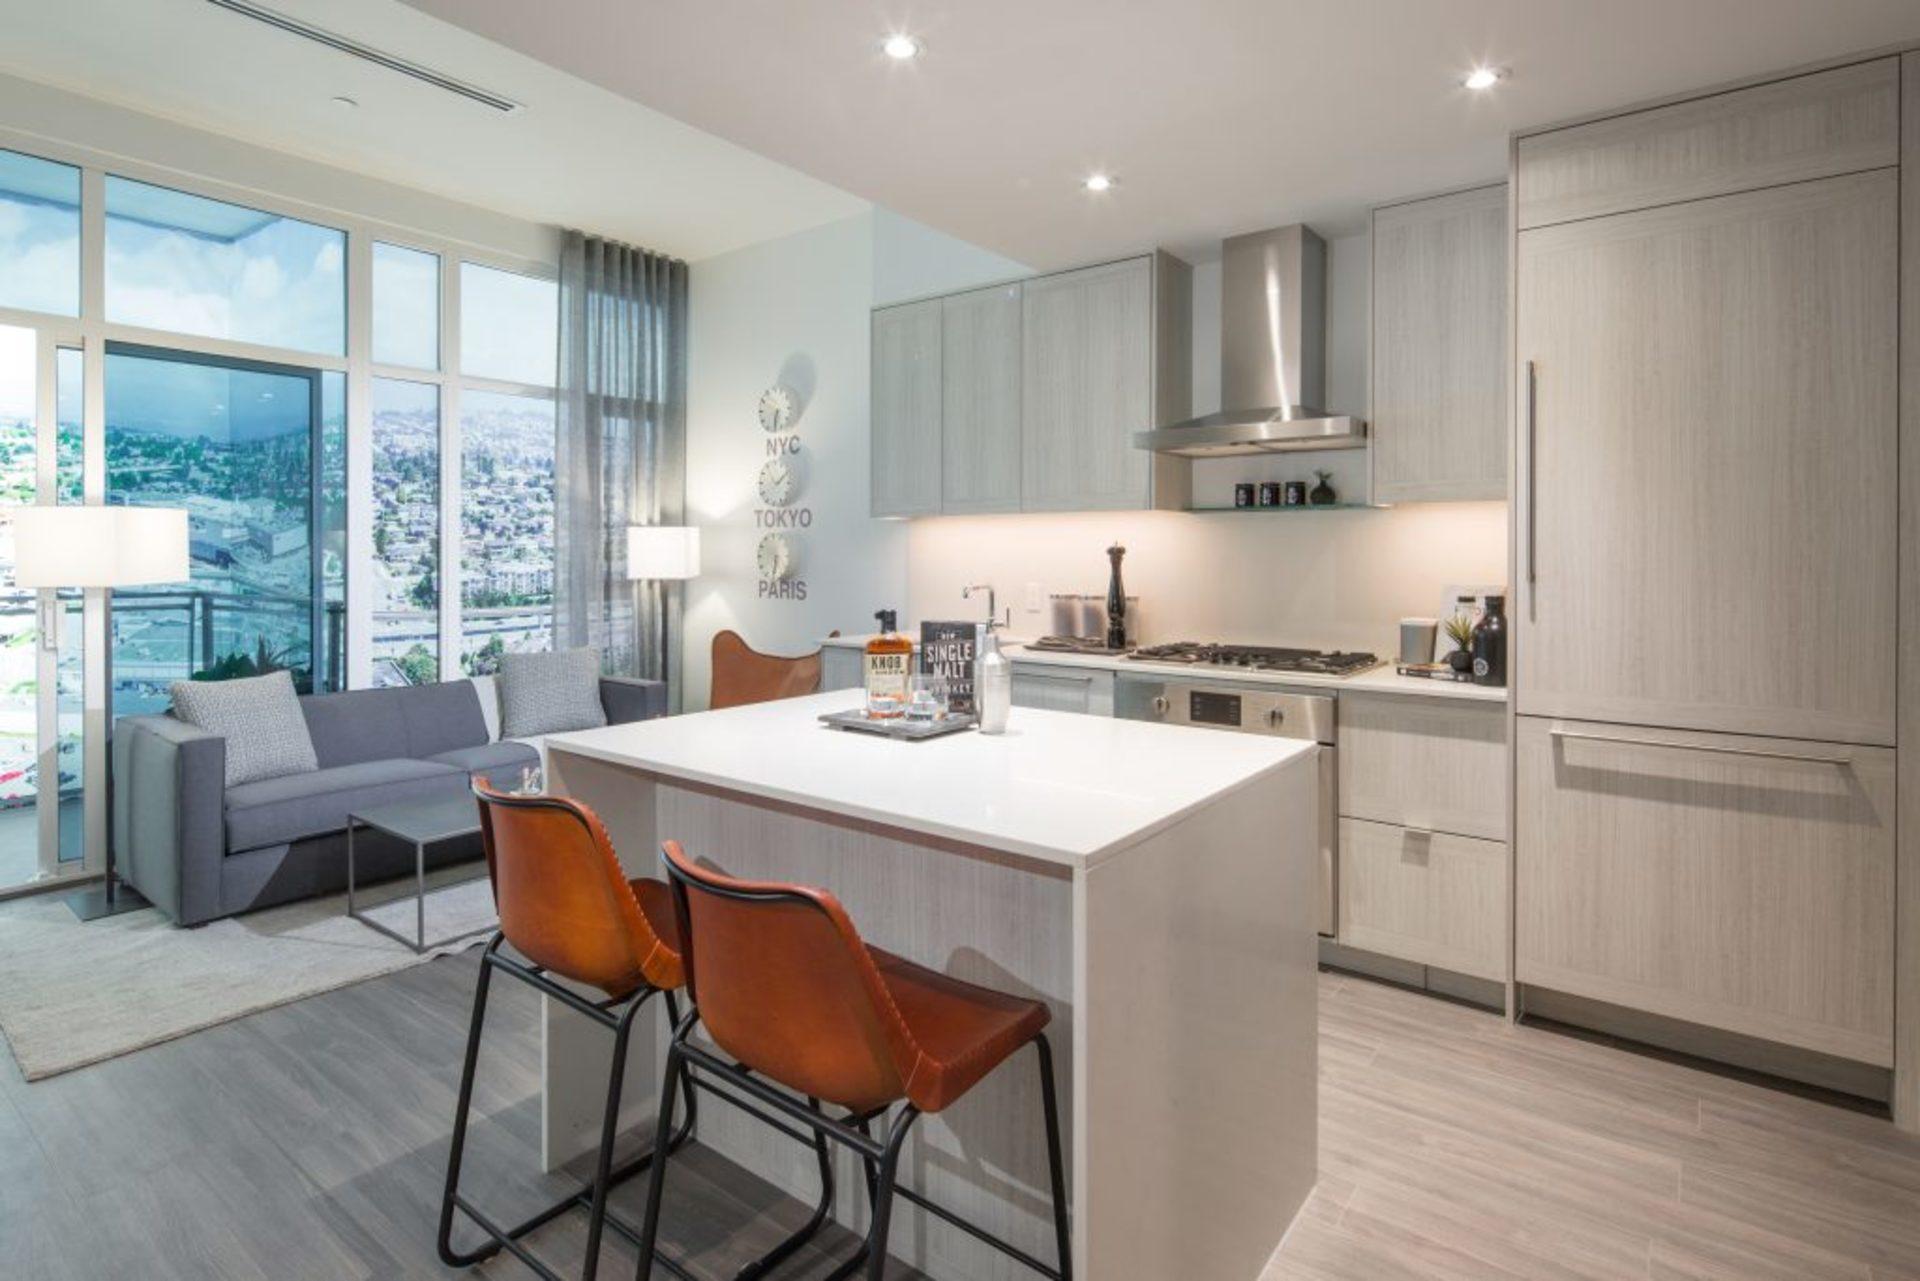 lumina-kitchen at Waterfall  -  Lumina (2425 Beta Avenue, Brentwood Park, Burnaby North)